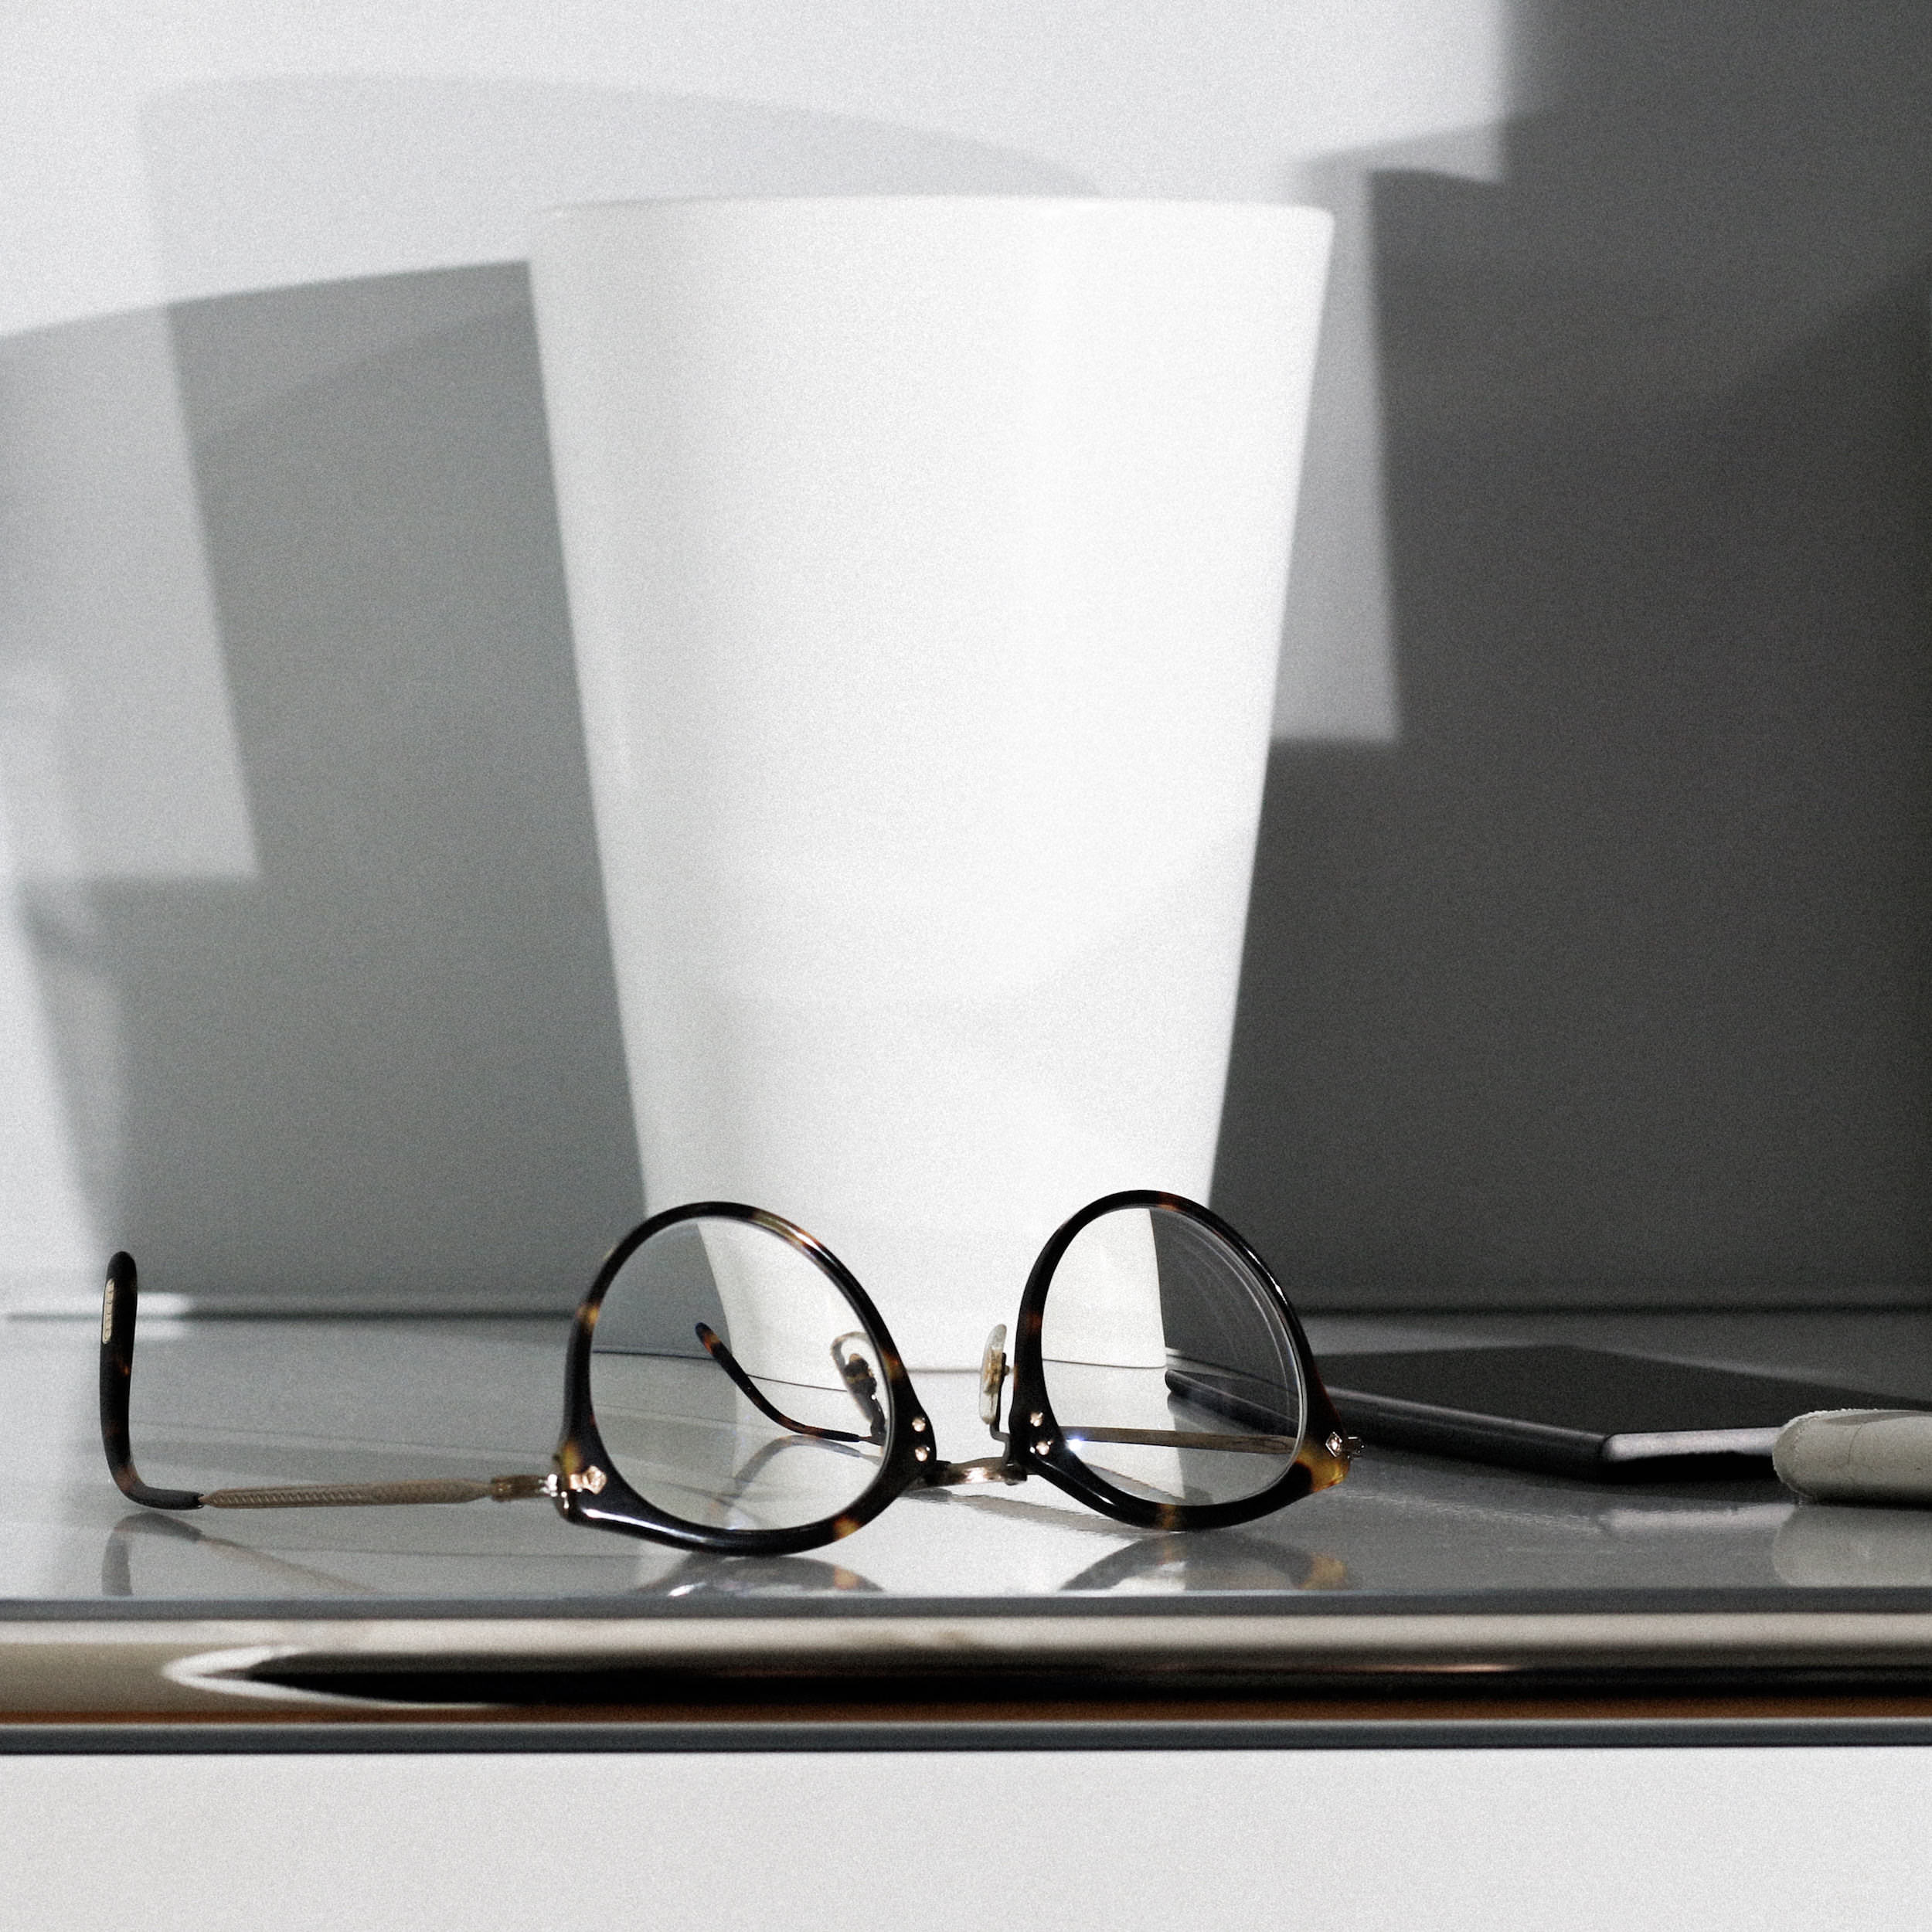 lunette oliver peoples verre nikon myopsee